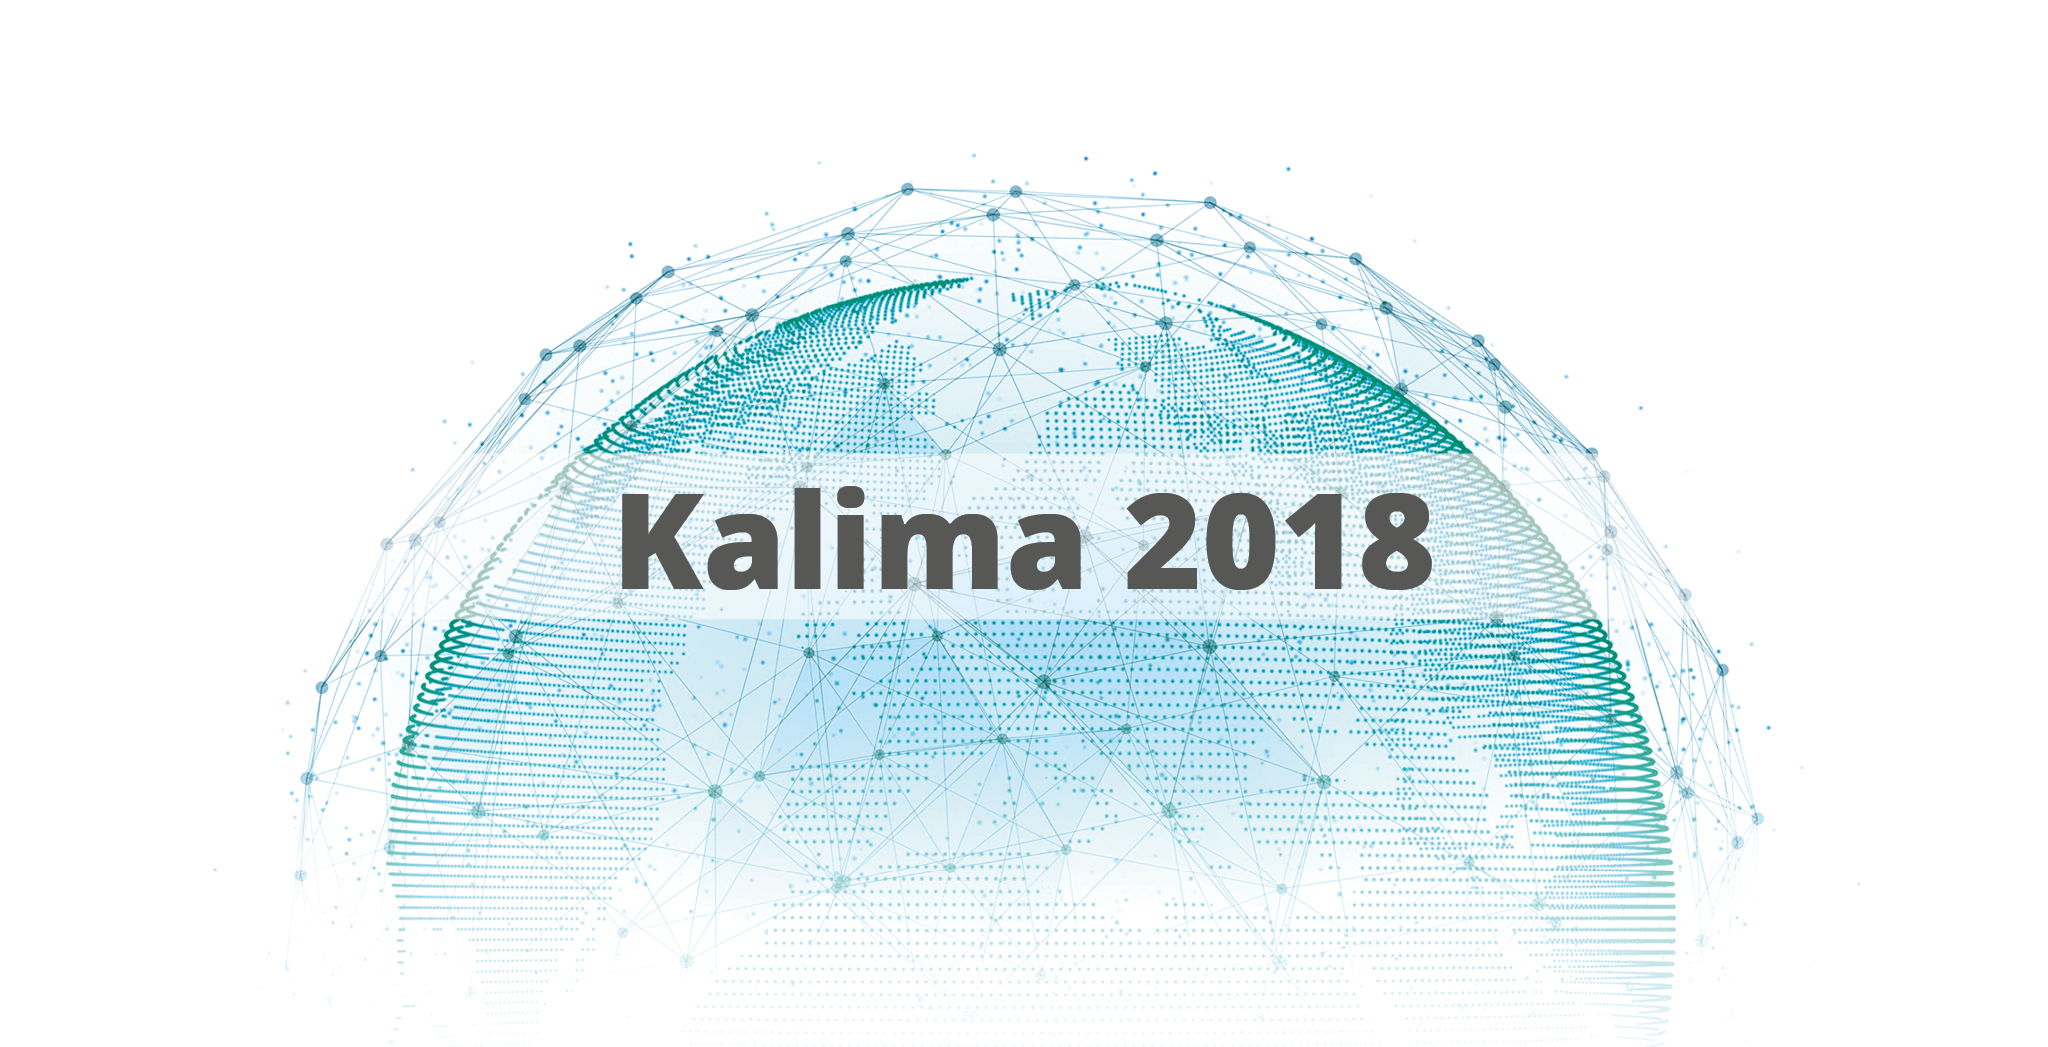 Kalima-Embedded-Blockchain